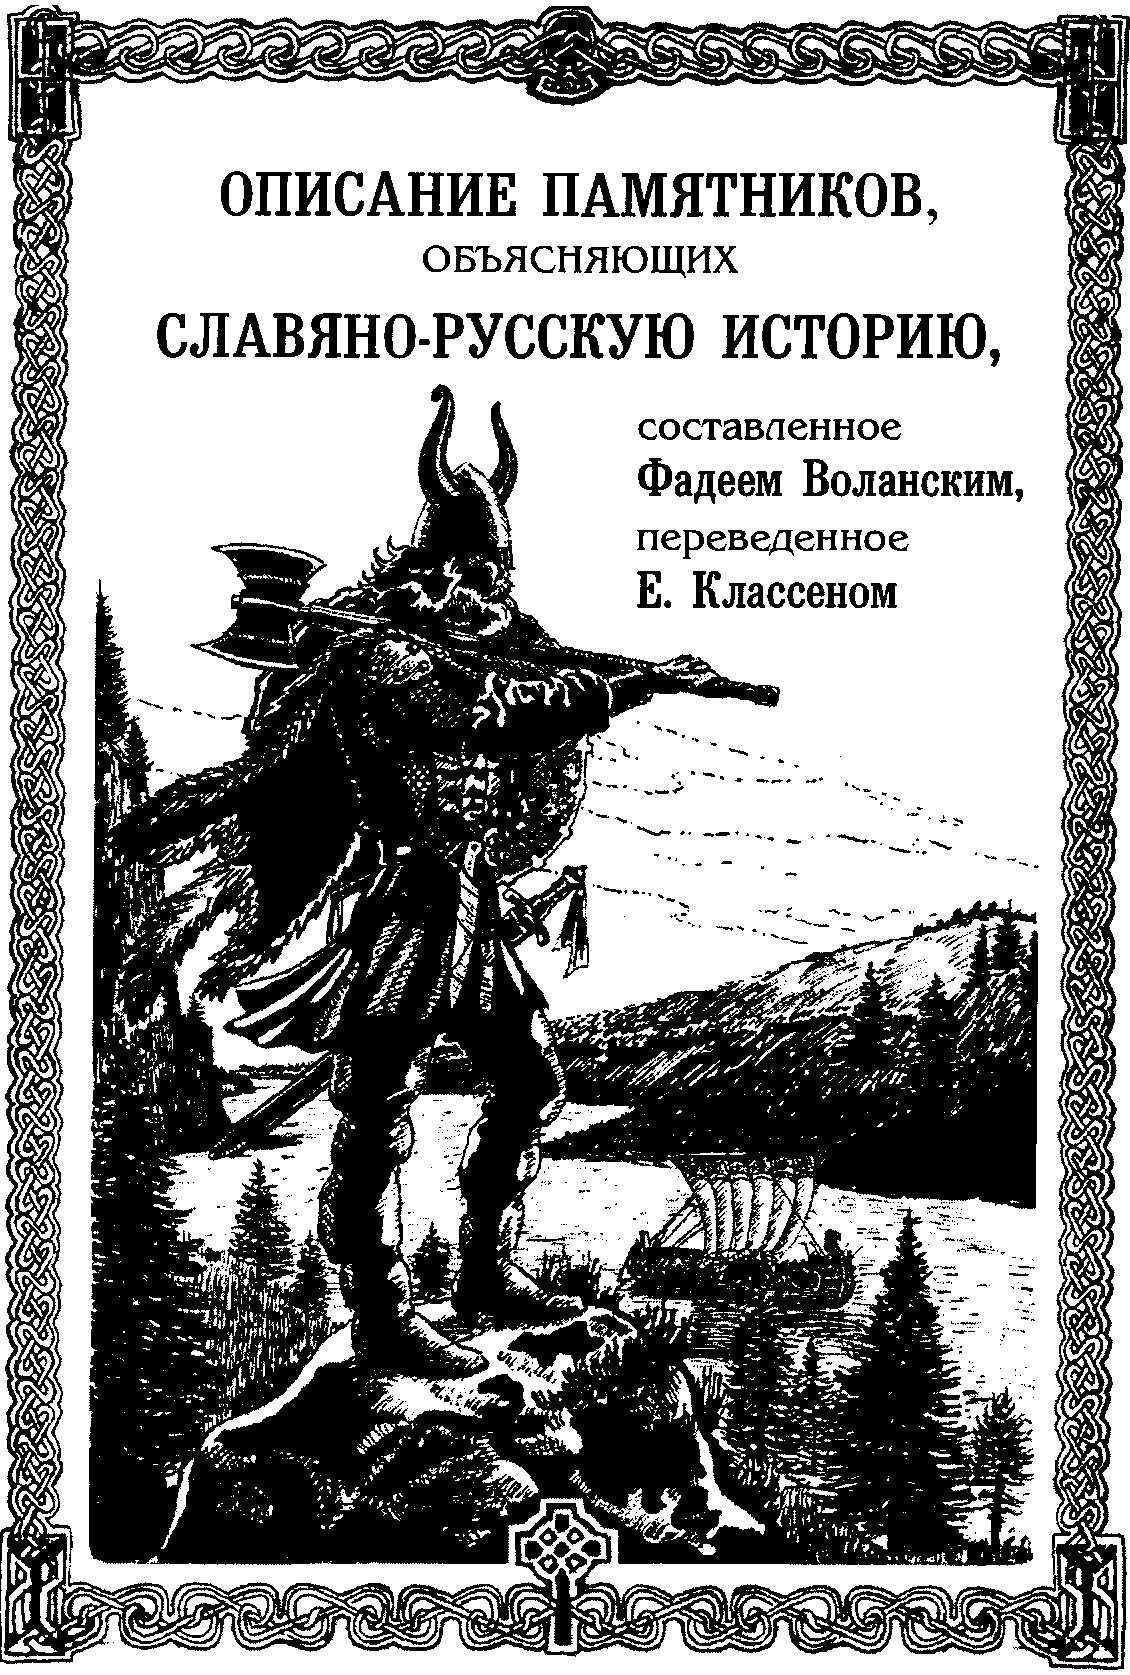 http://s7.uploads.ru/AaUlQ.png